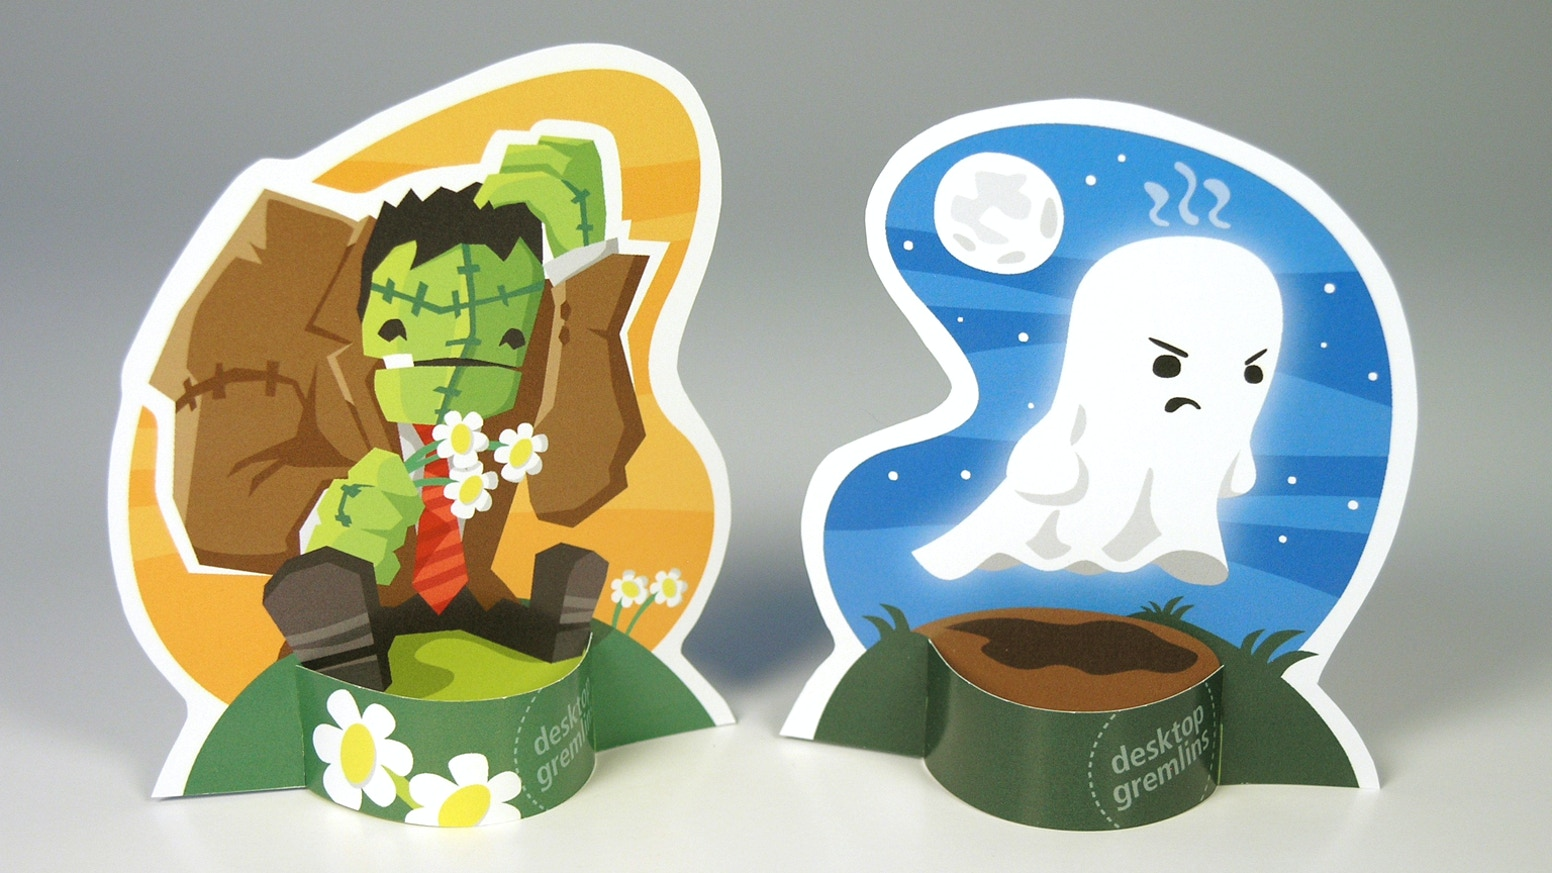 Desktop Gremlins Papercraft: Spooky Monsters by David Landis